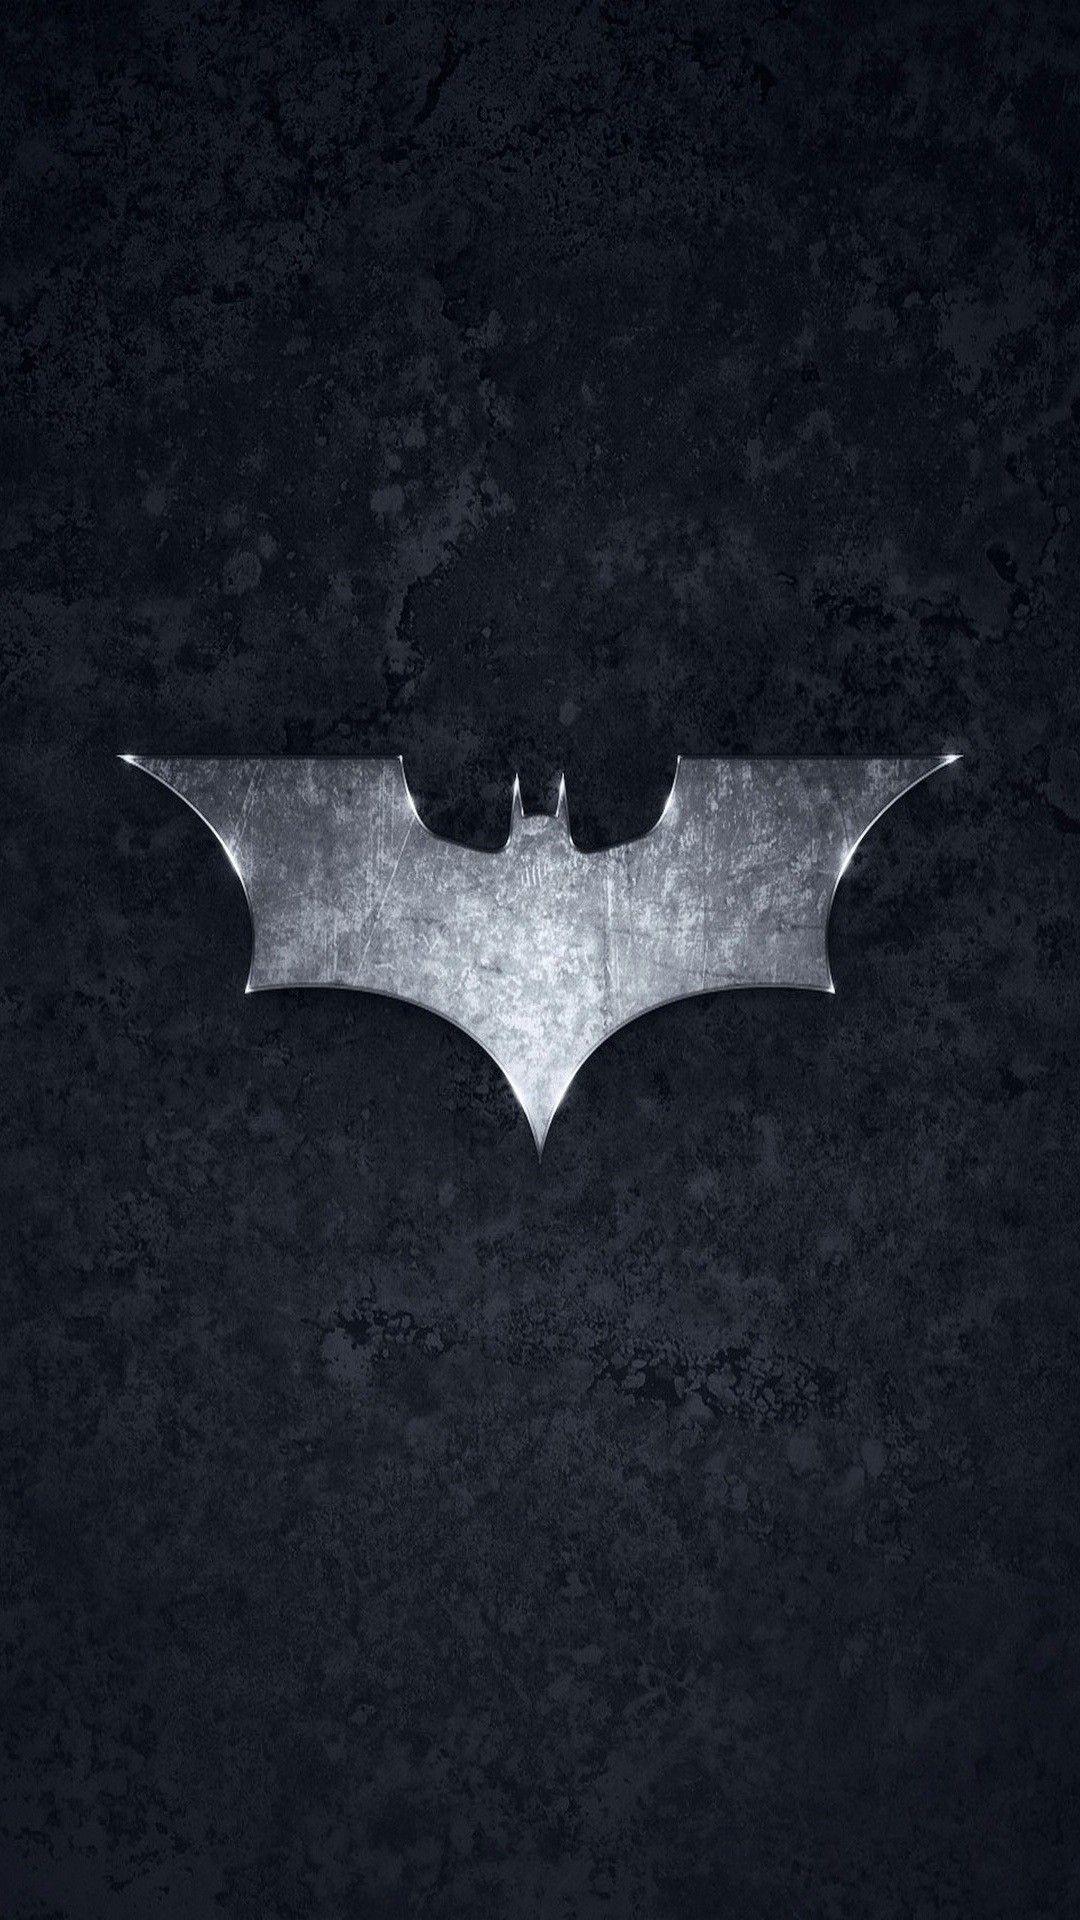 Batman HD Android Phone Wallpapers - Wallpaper Cave